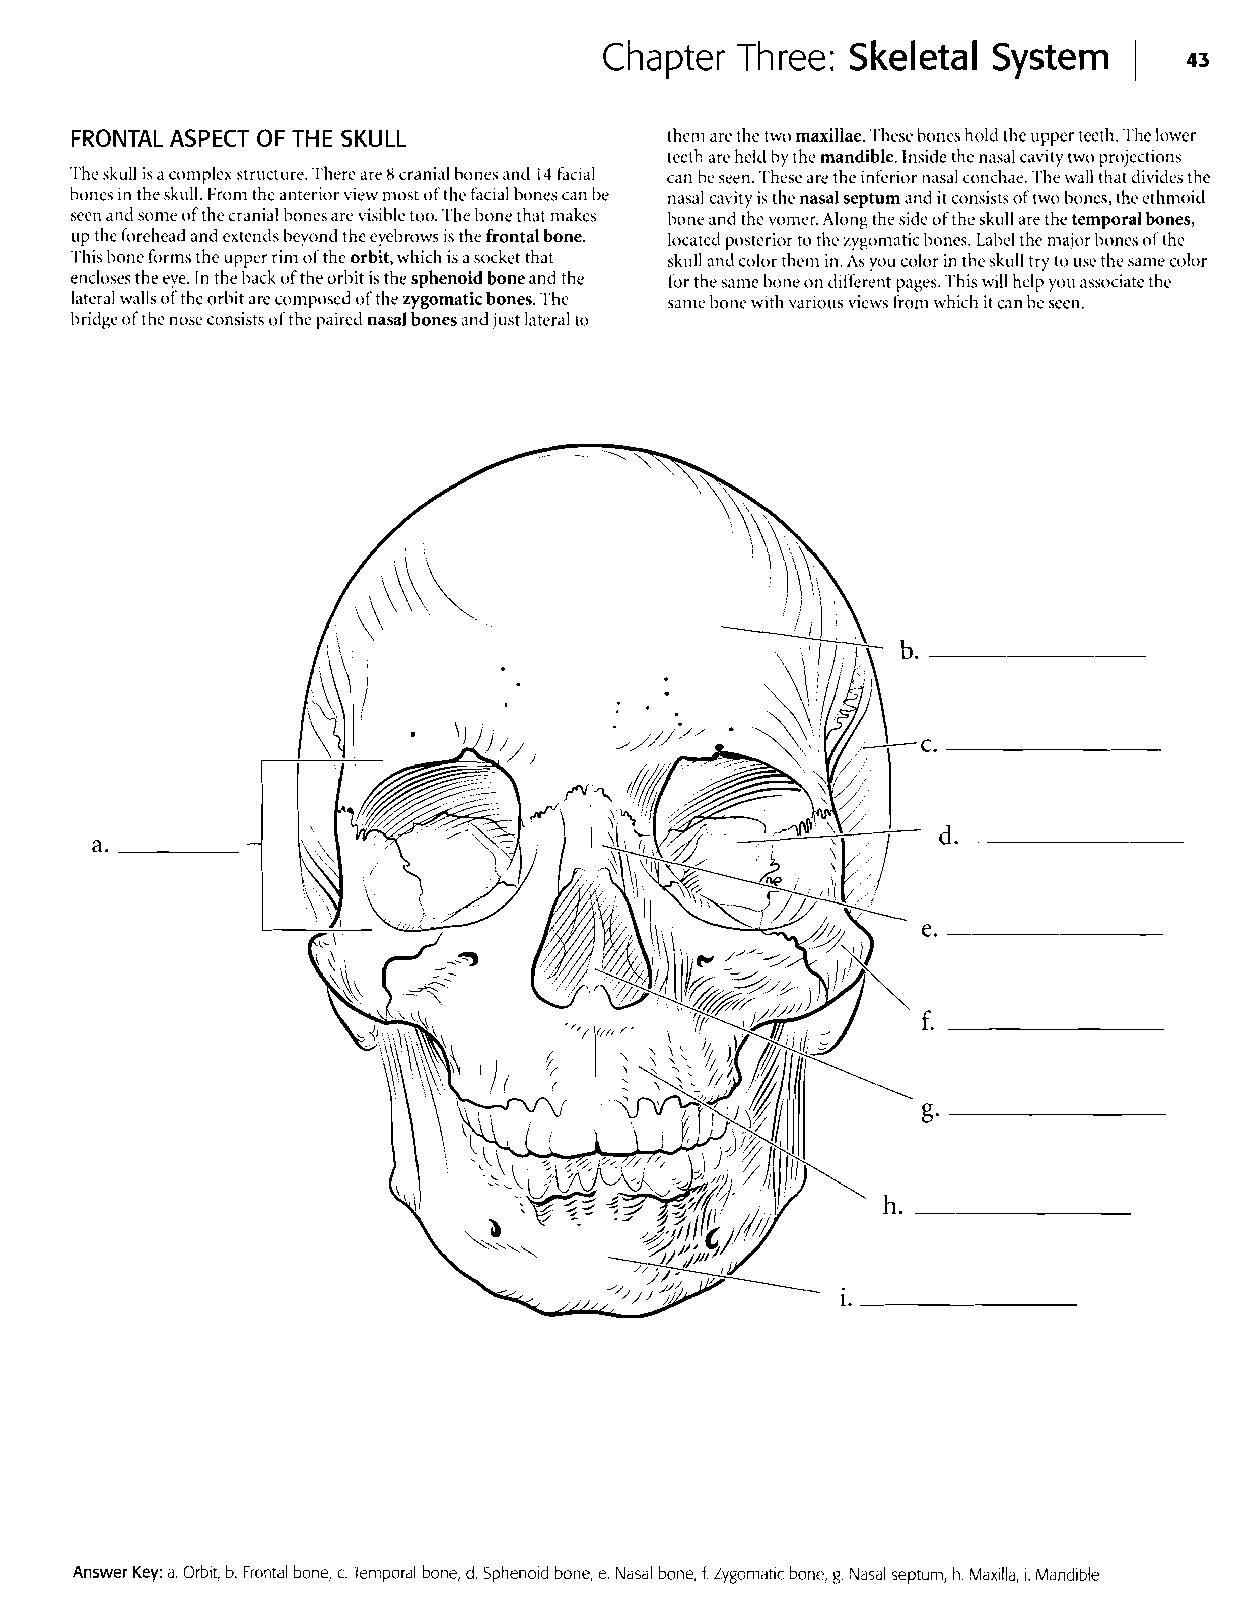 Human Anatomy Coloring Book.pdf : human, anatomy, coloring, book.pdf, Beautiful, Kaplan, Anatomy, Coloring, AnyOneForAnyaTeam